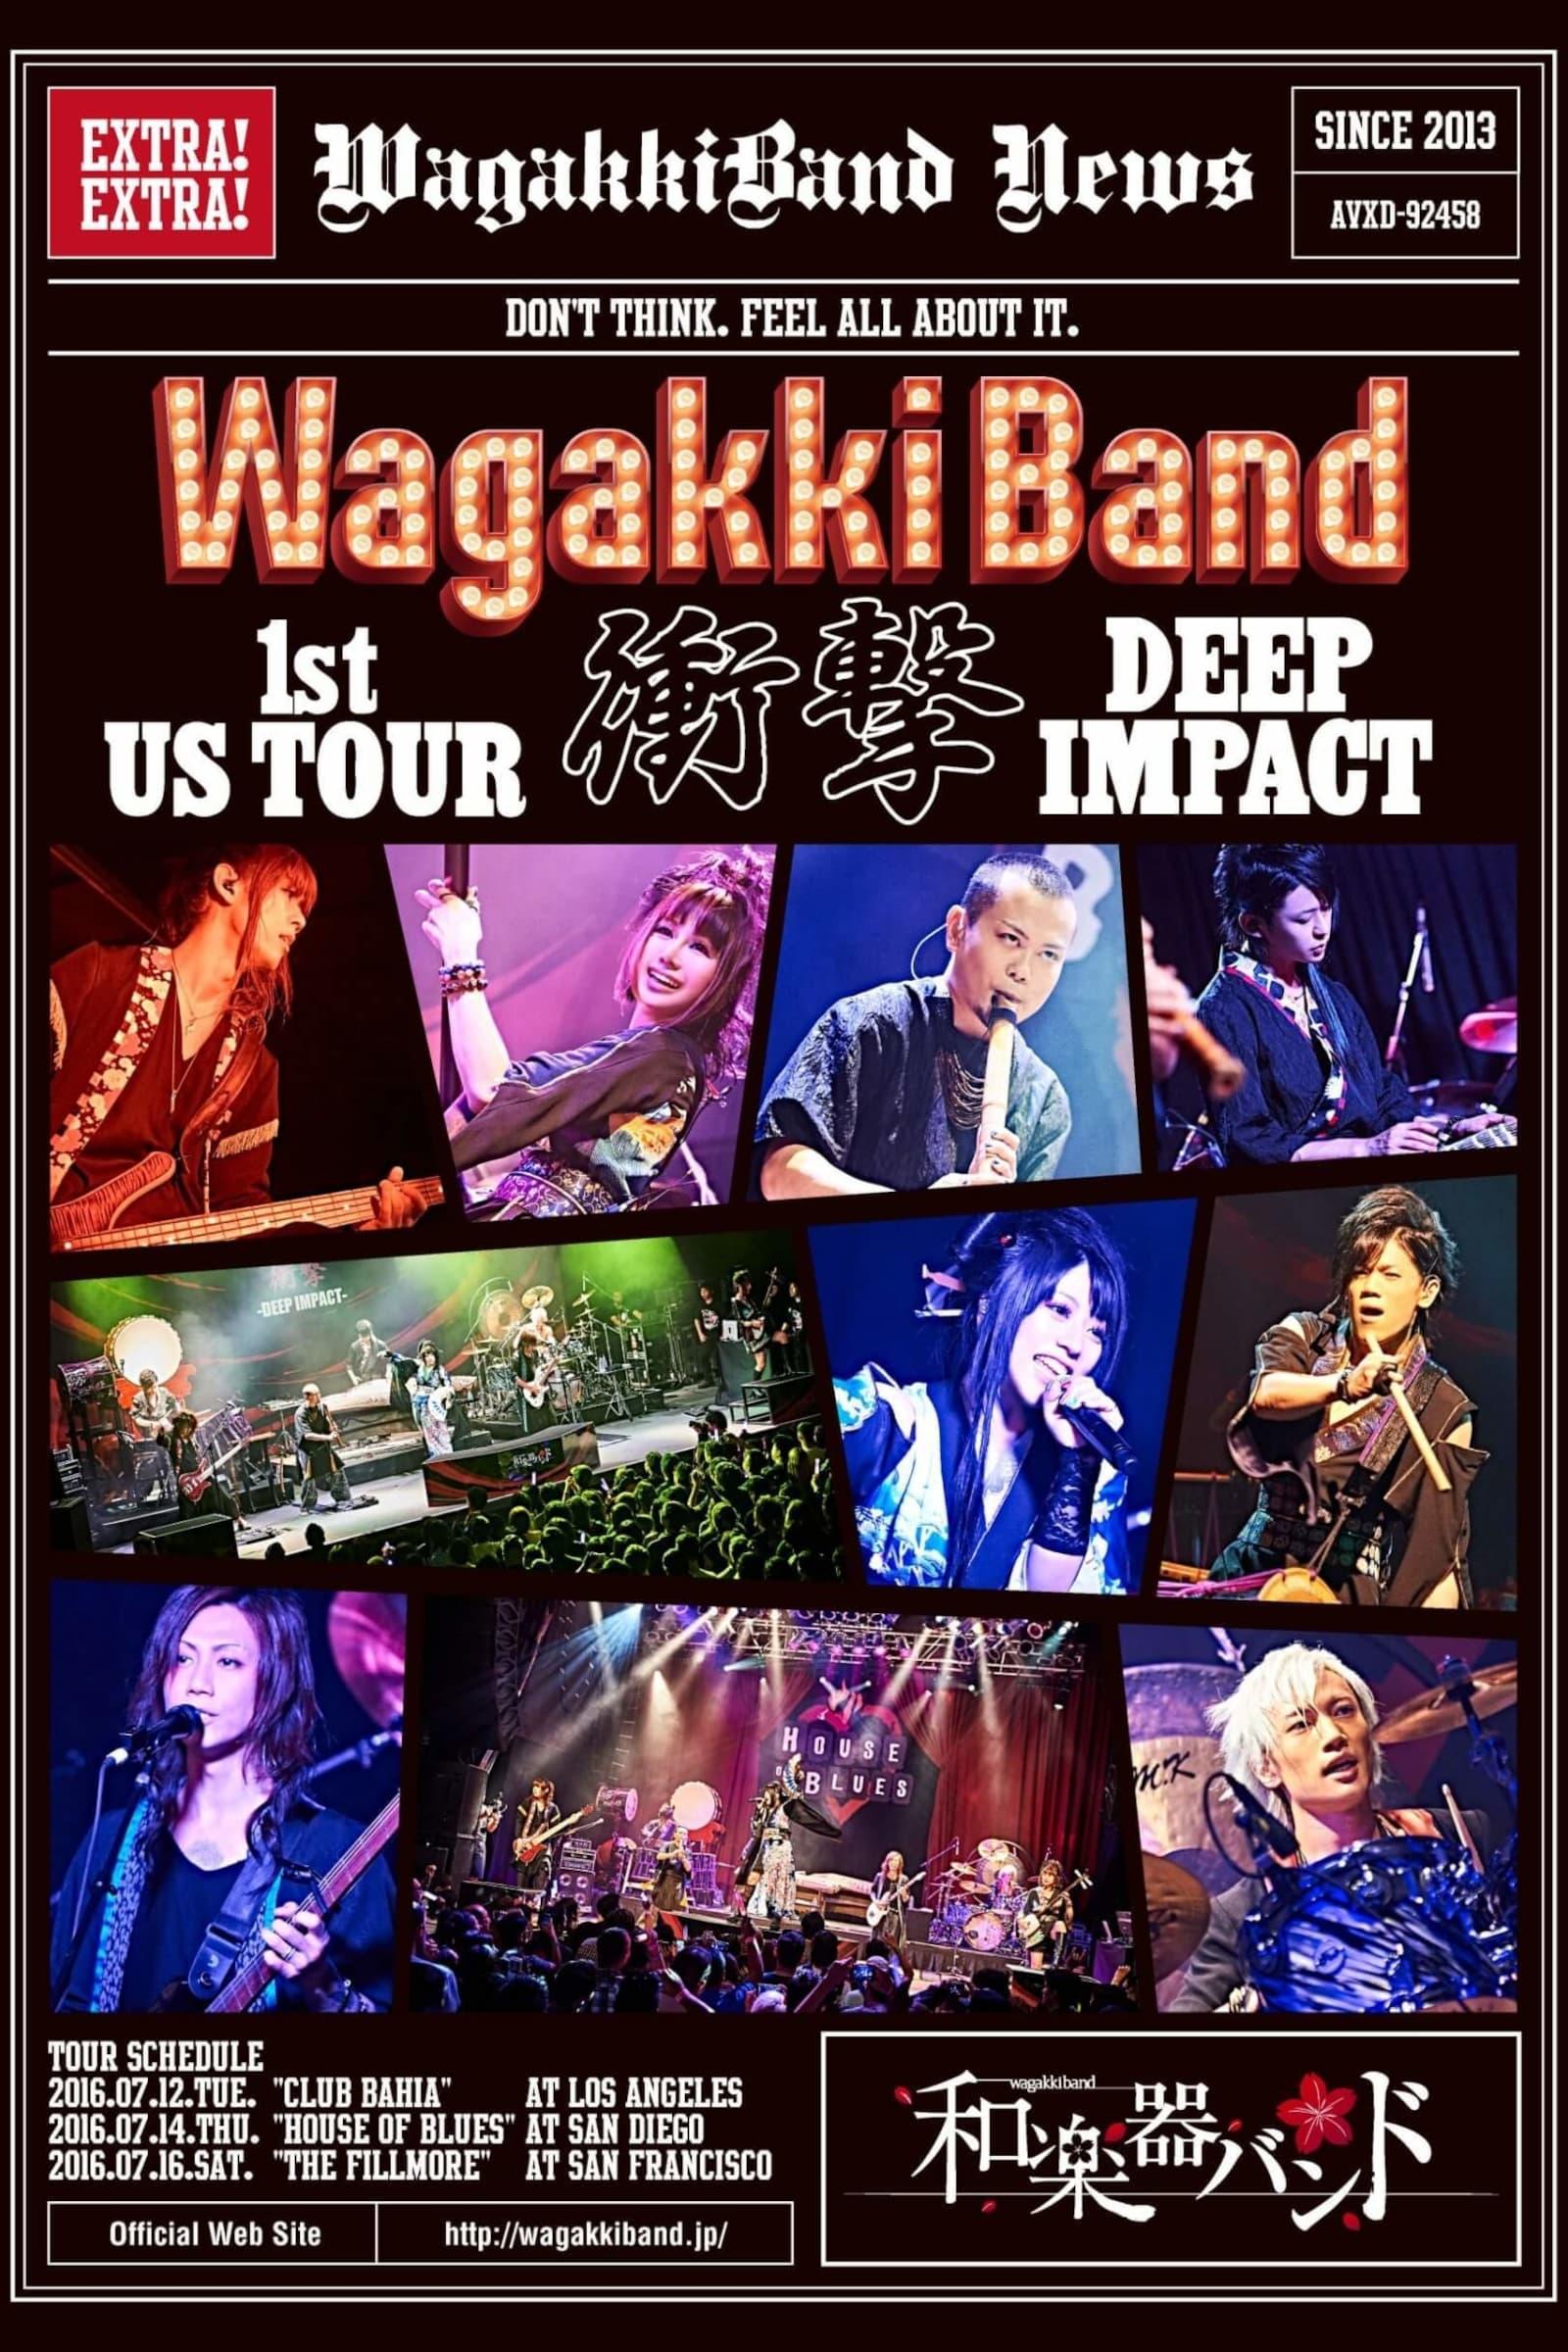 WagakkiBand 1st US Tour Shogeki -DEEP IMPACT-